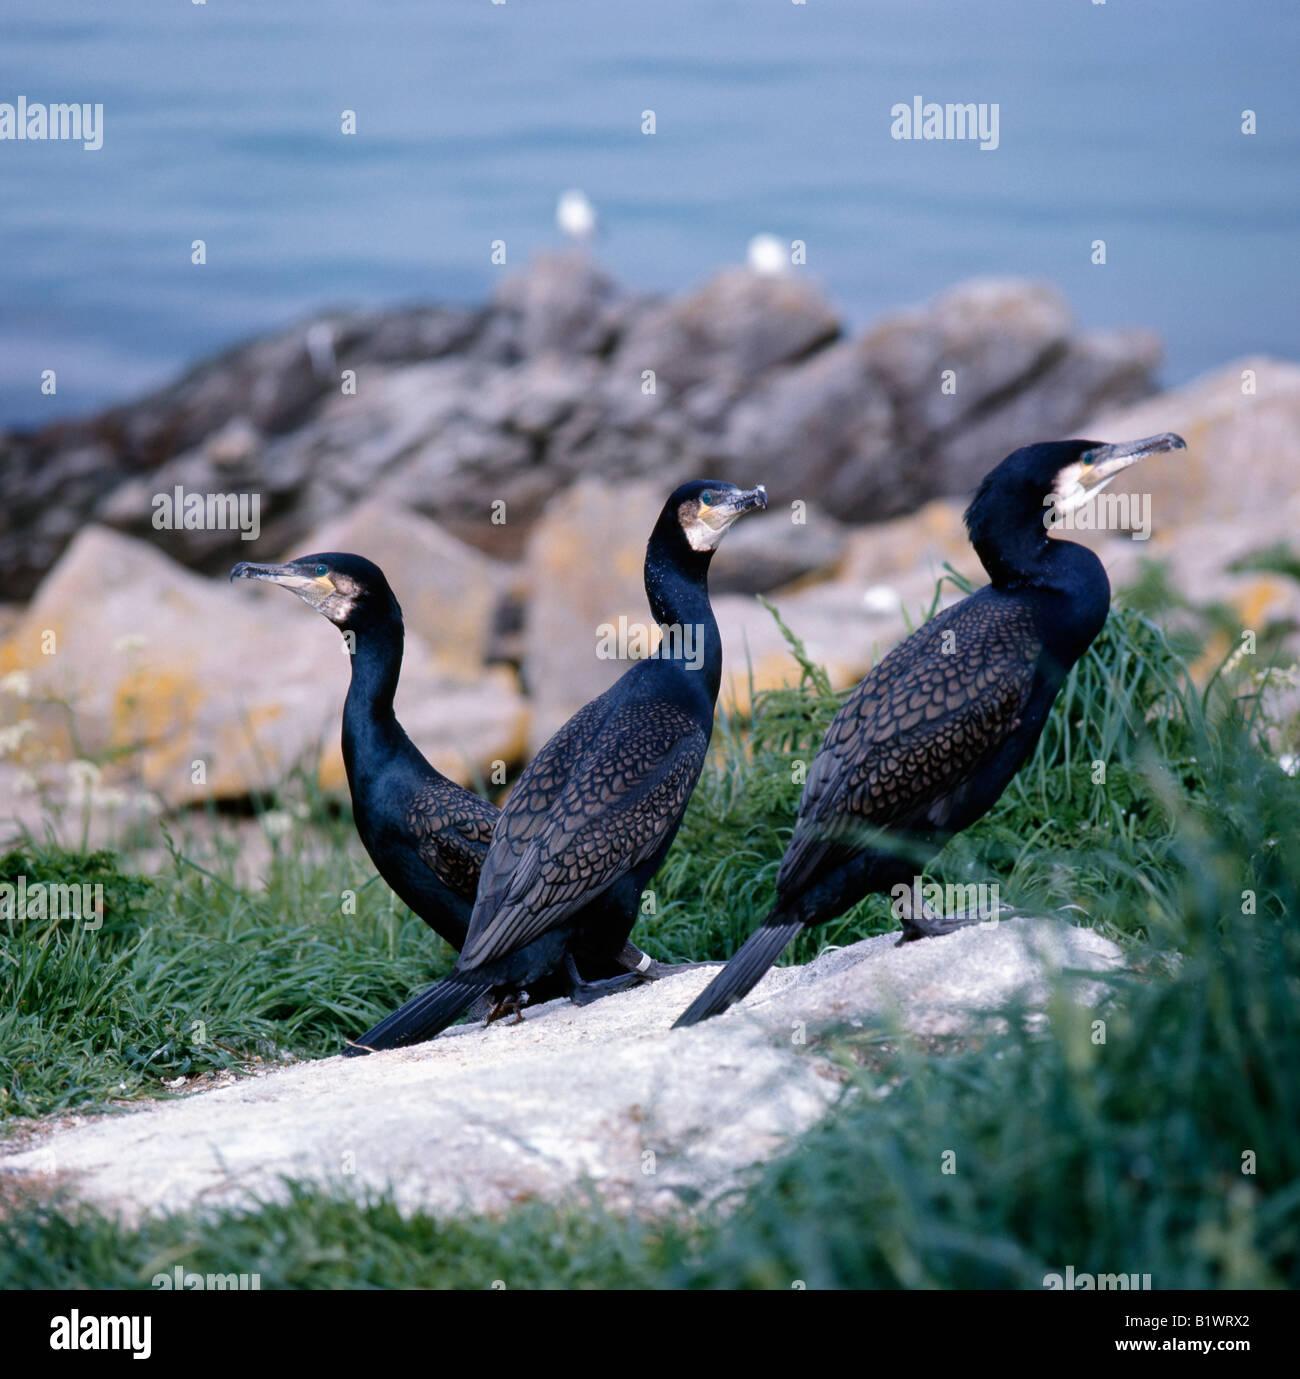 grand cormoran Great Cormorant Phalacrocorax carbo Africa Afrika animals Asia Asien Aves birds Cormoran commun cormorants - Stock Image